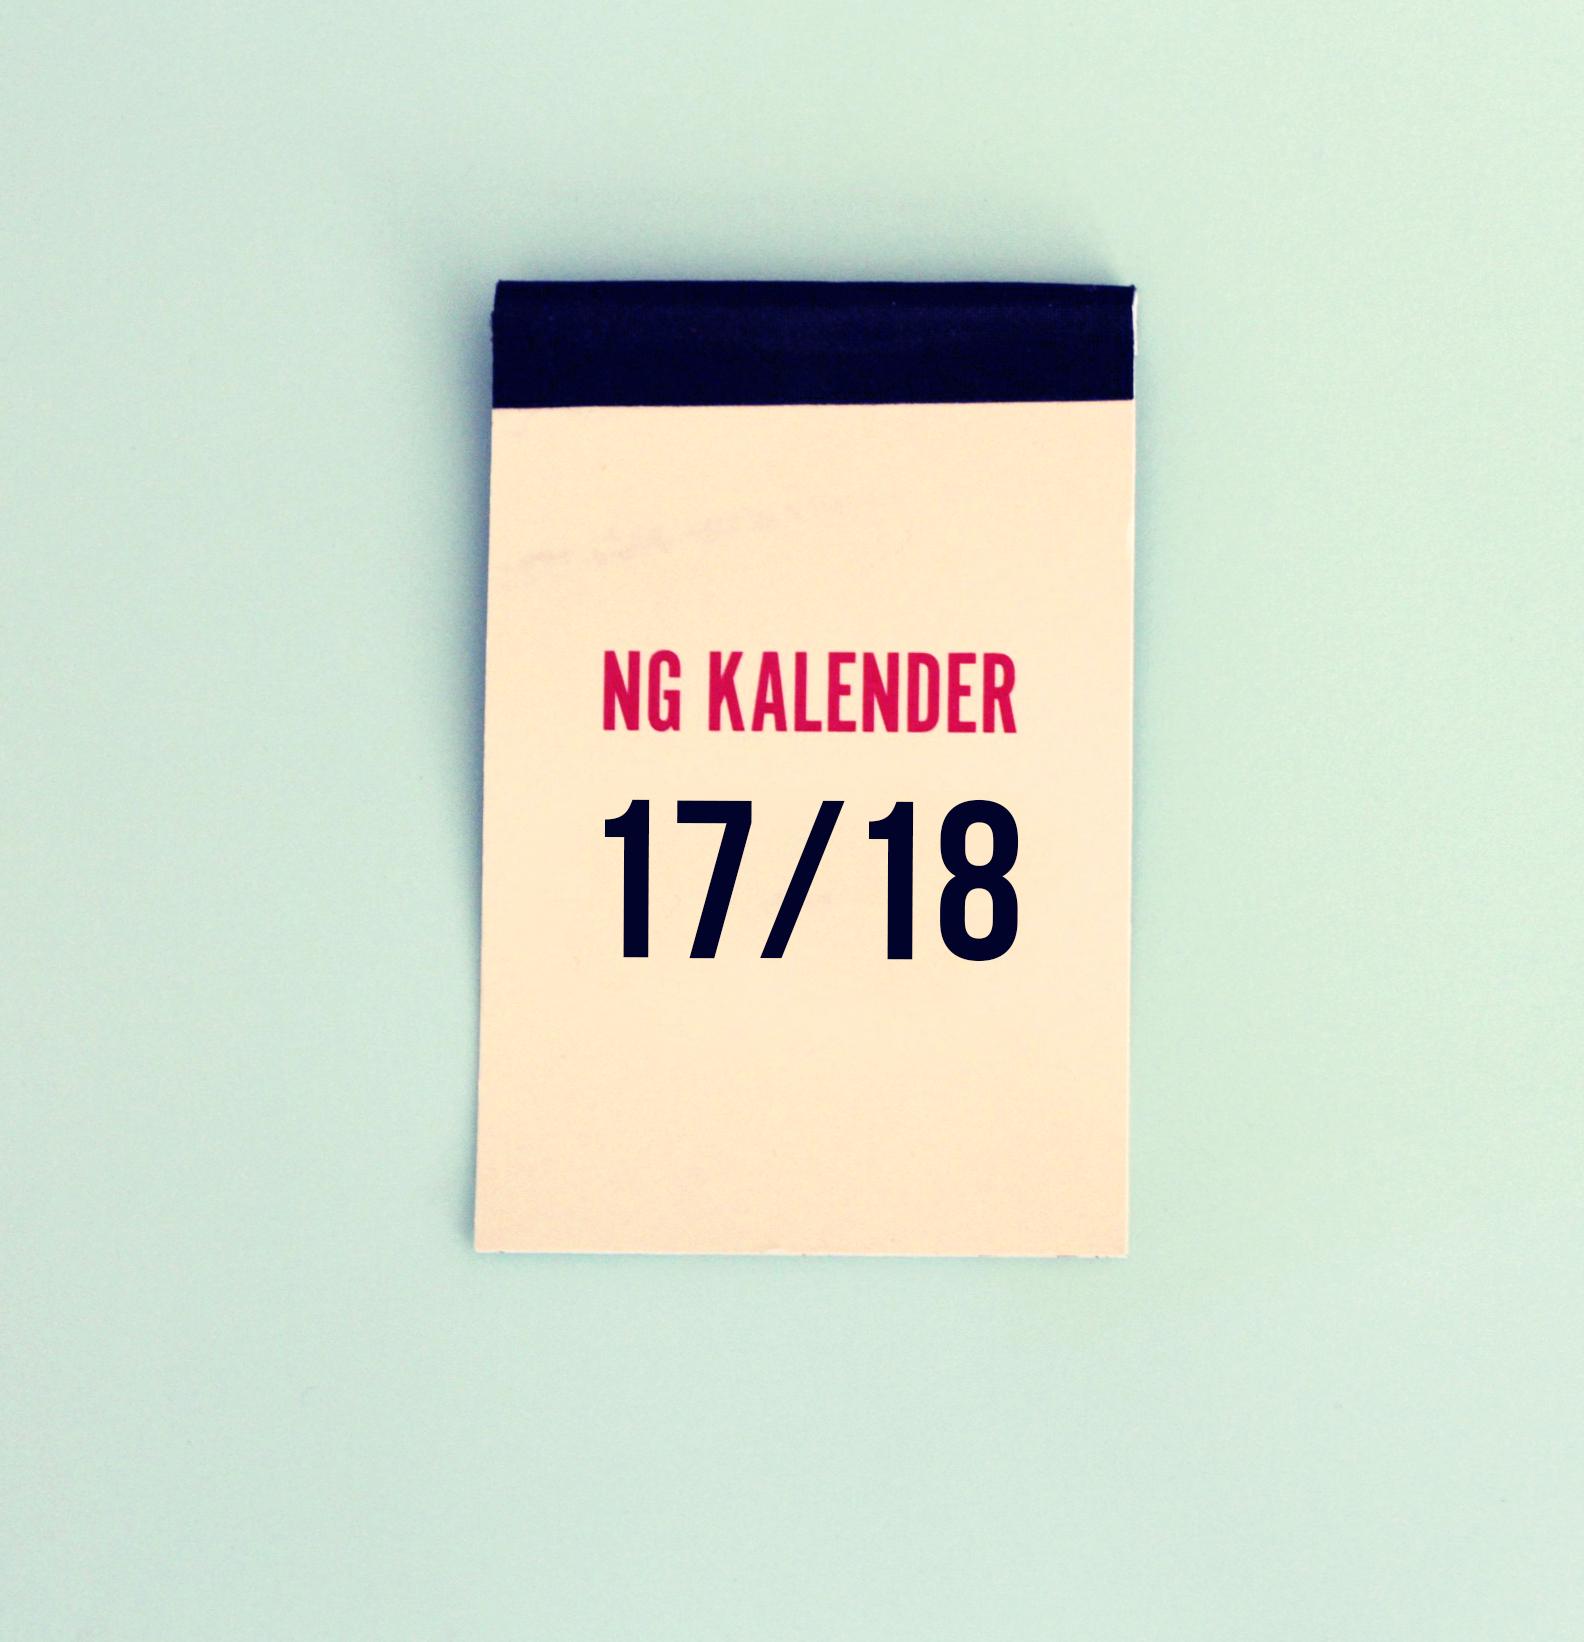 kalender1718 (2).jpg